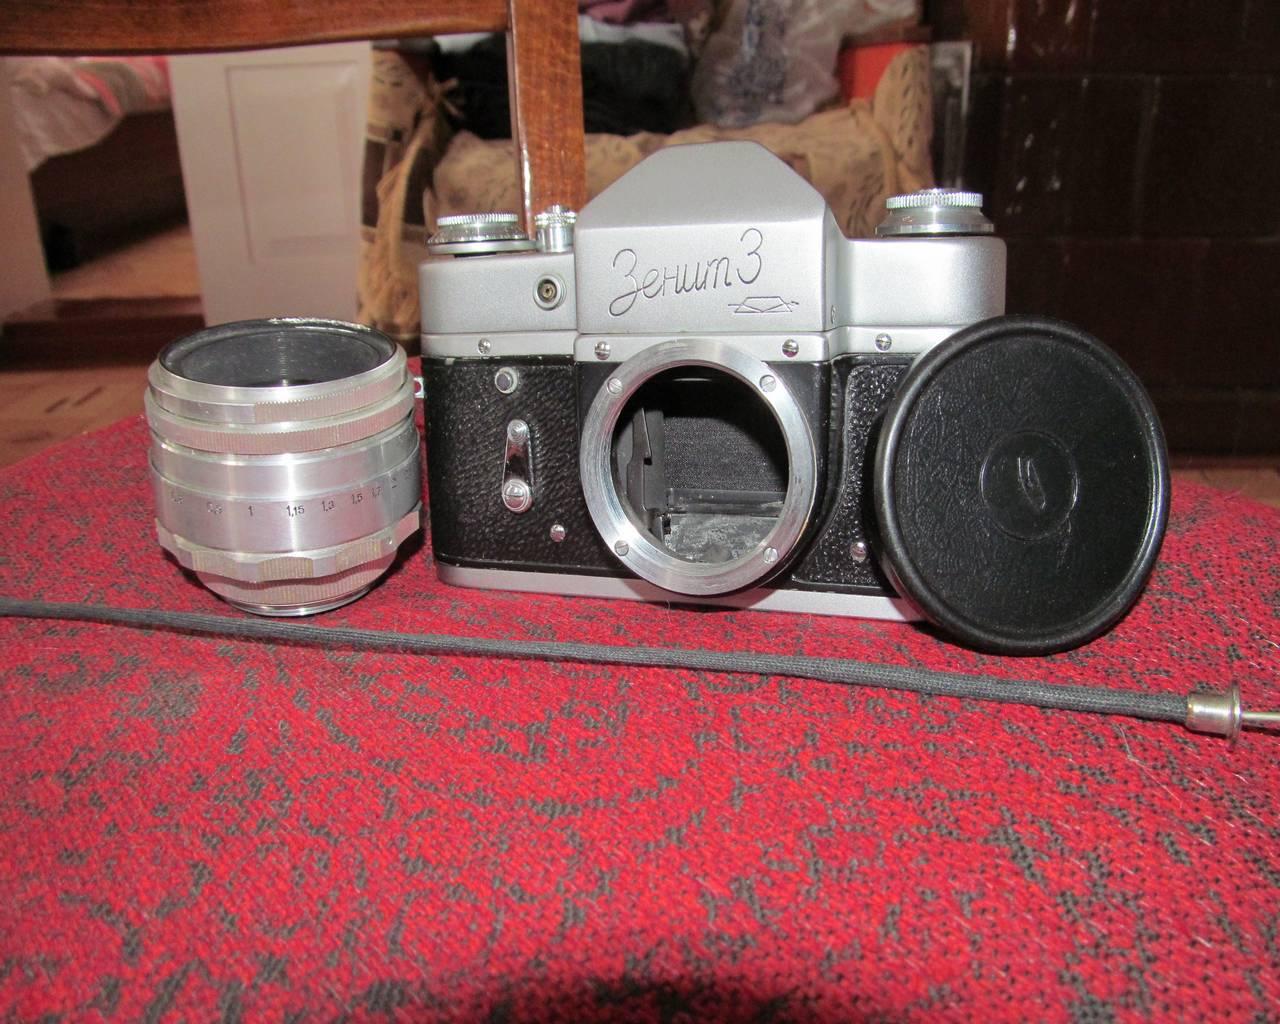 Цифровой фотоаппарат из зенита своими руками